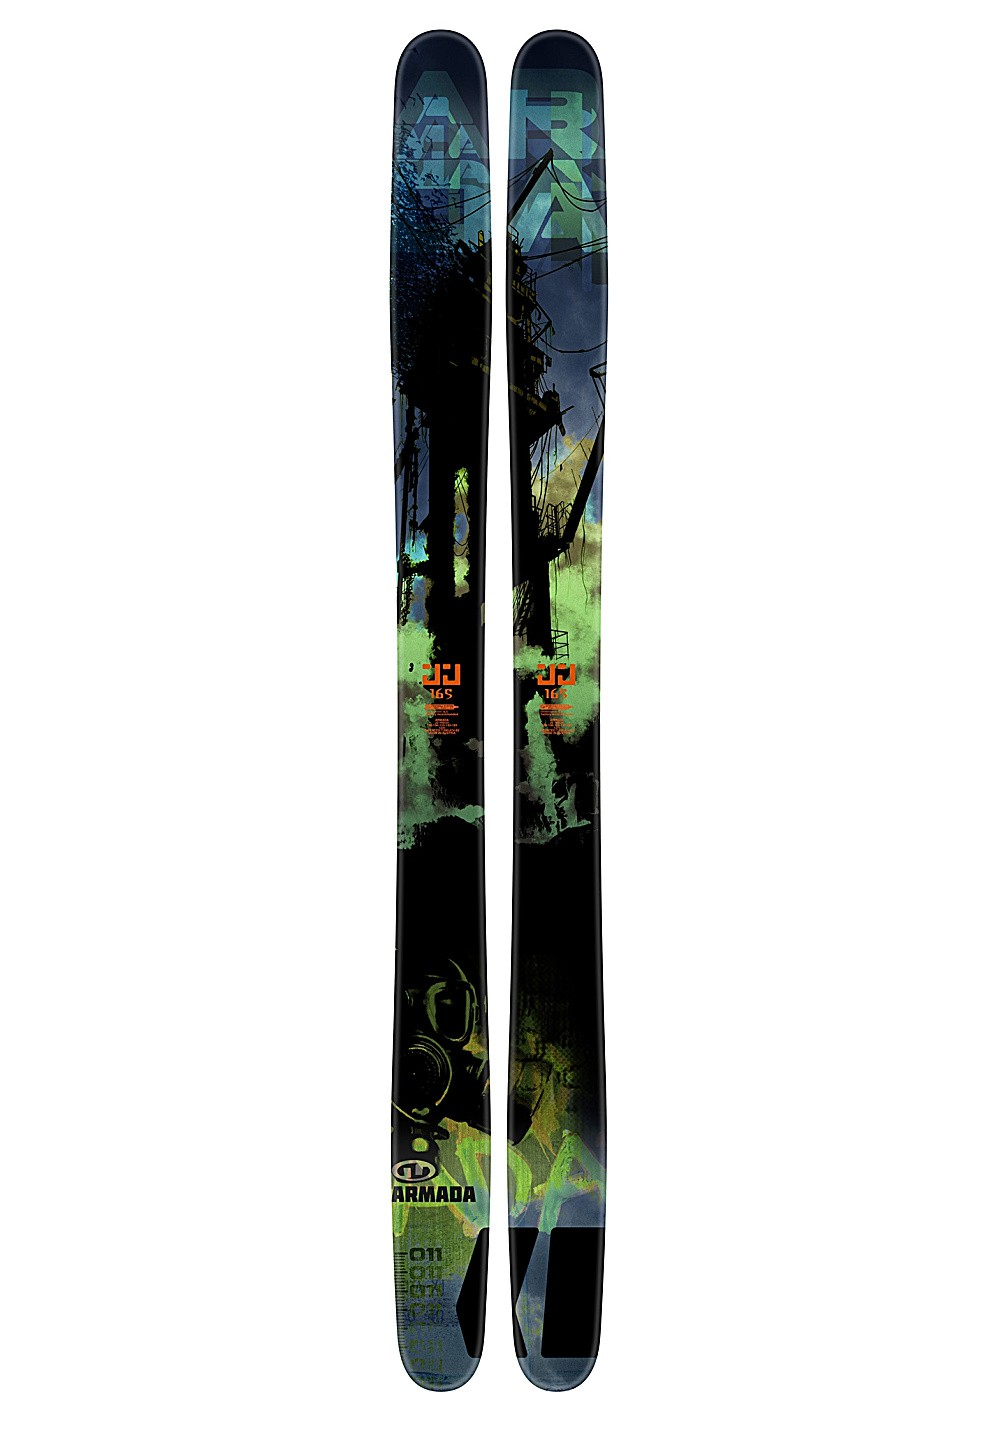 Armada JJ skis 185